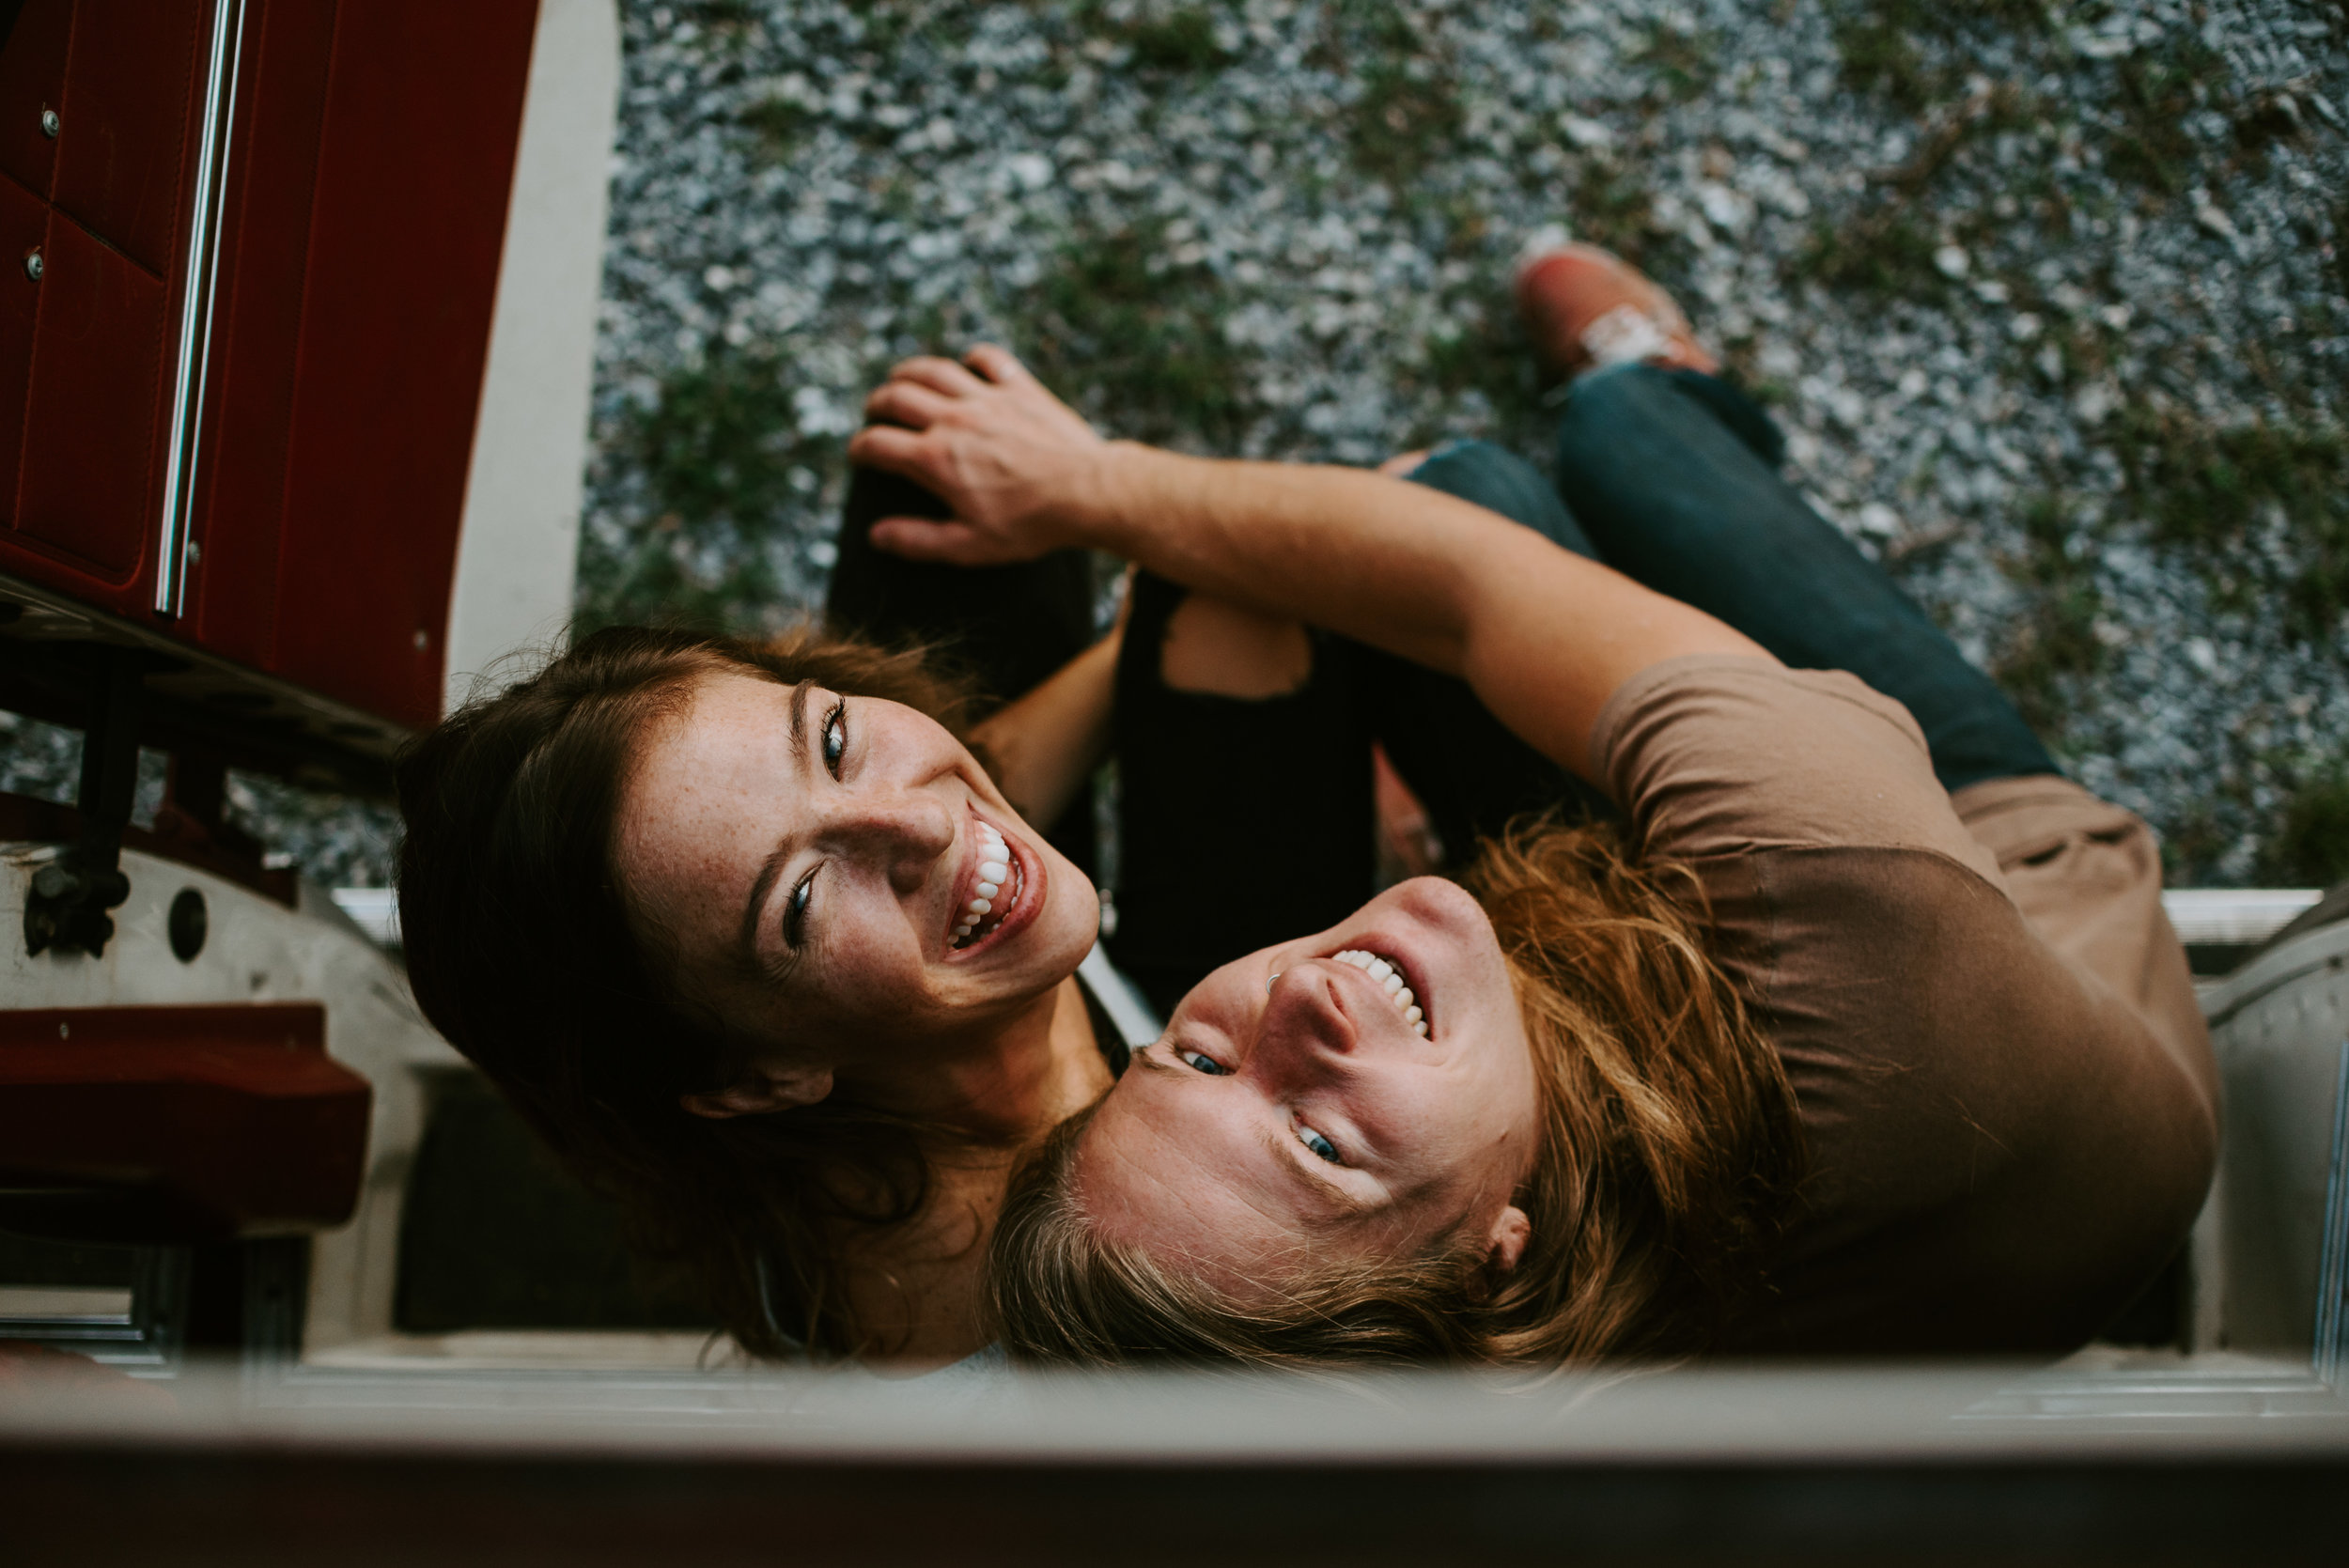 WonderlyCreative_Couples_7.9.18_Cameron&Alexis_-271.jpg